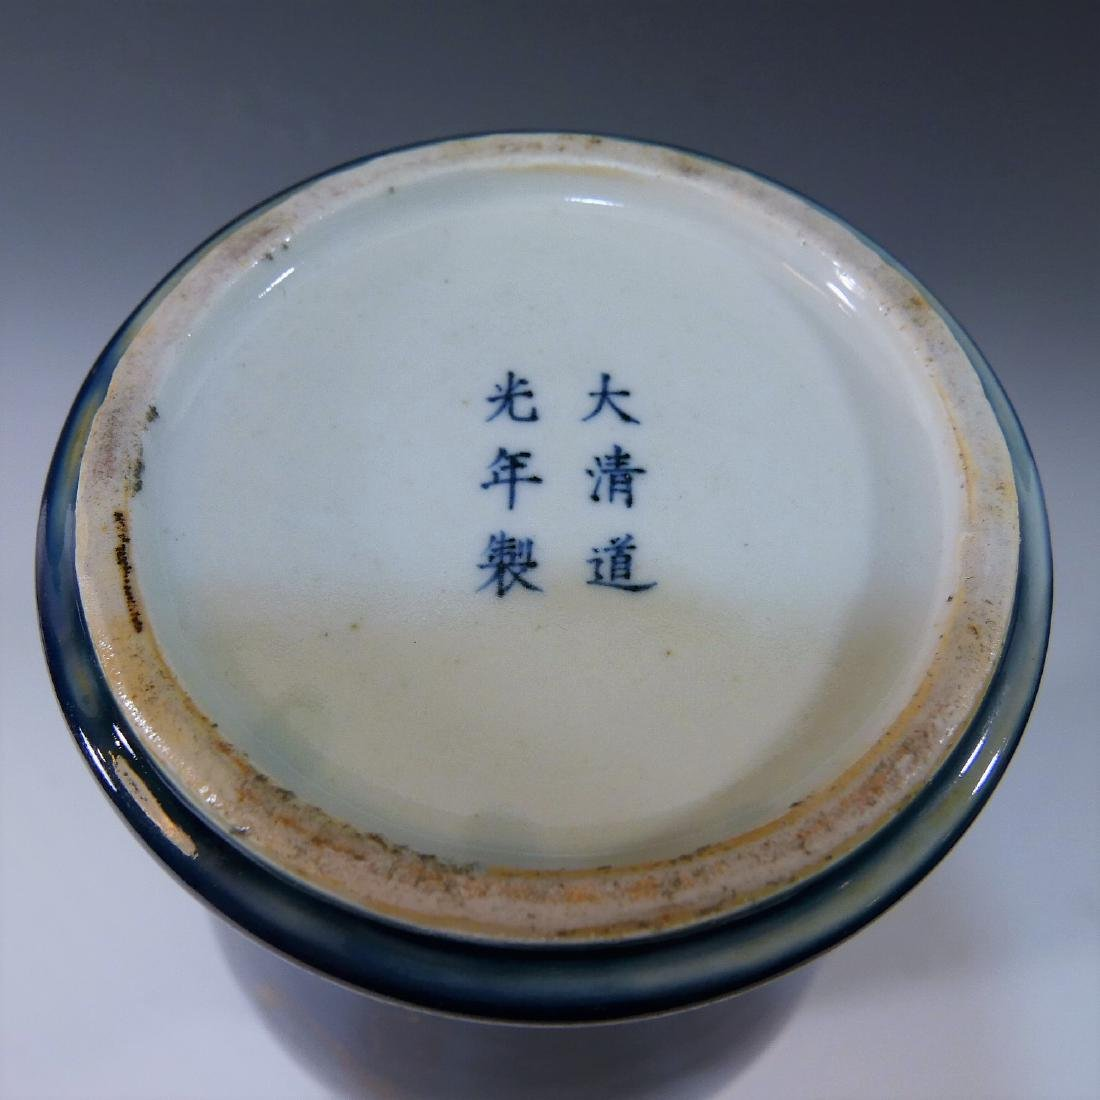 CHINESE ANTIQUE BLUE GLAZE GILT YEN YEN VASE - DAOGUANG - 4